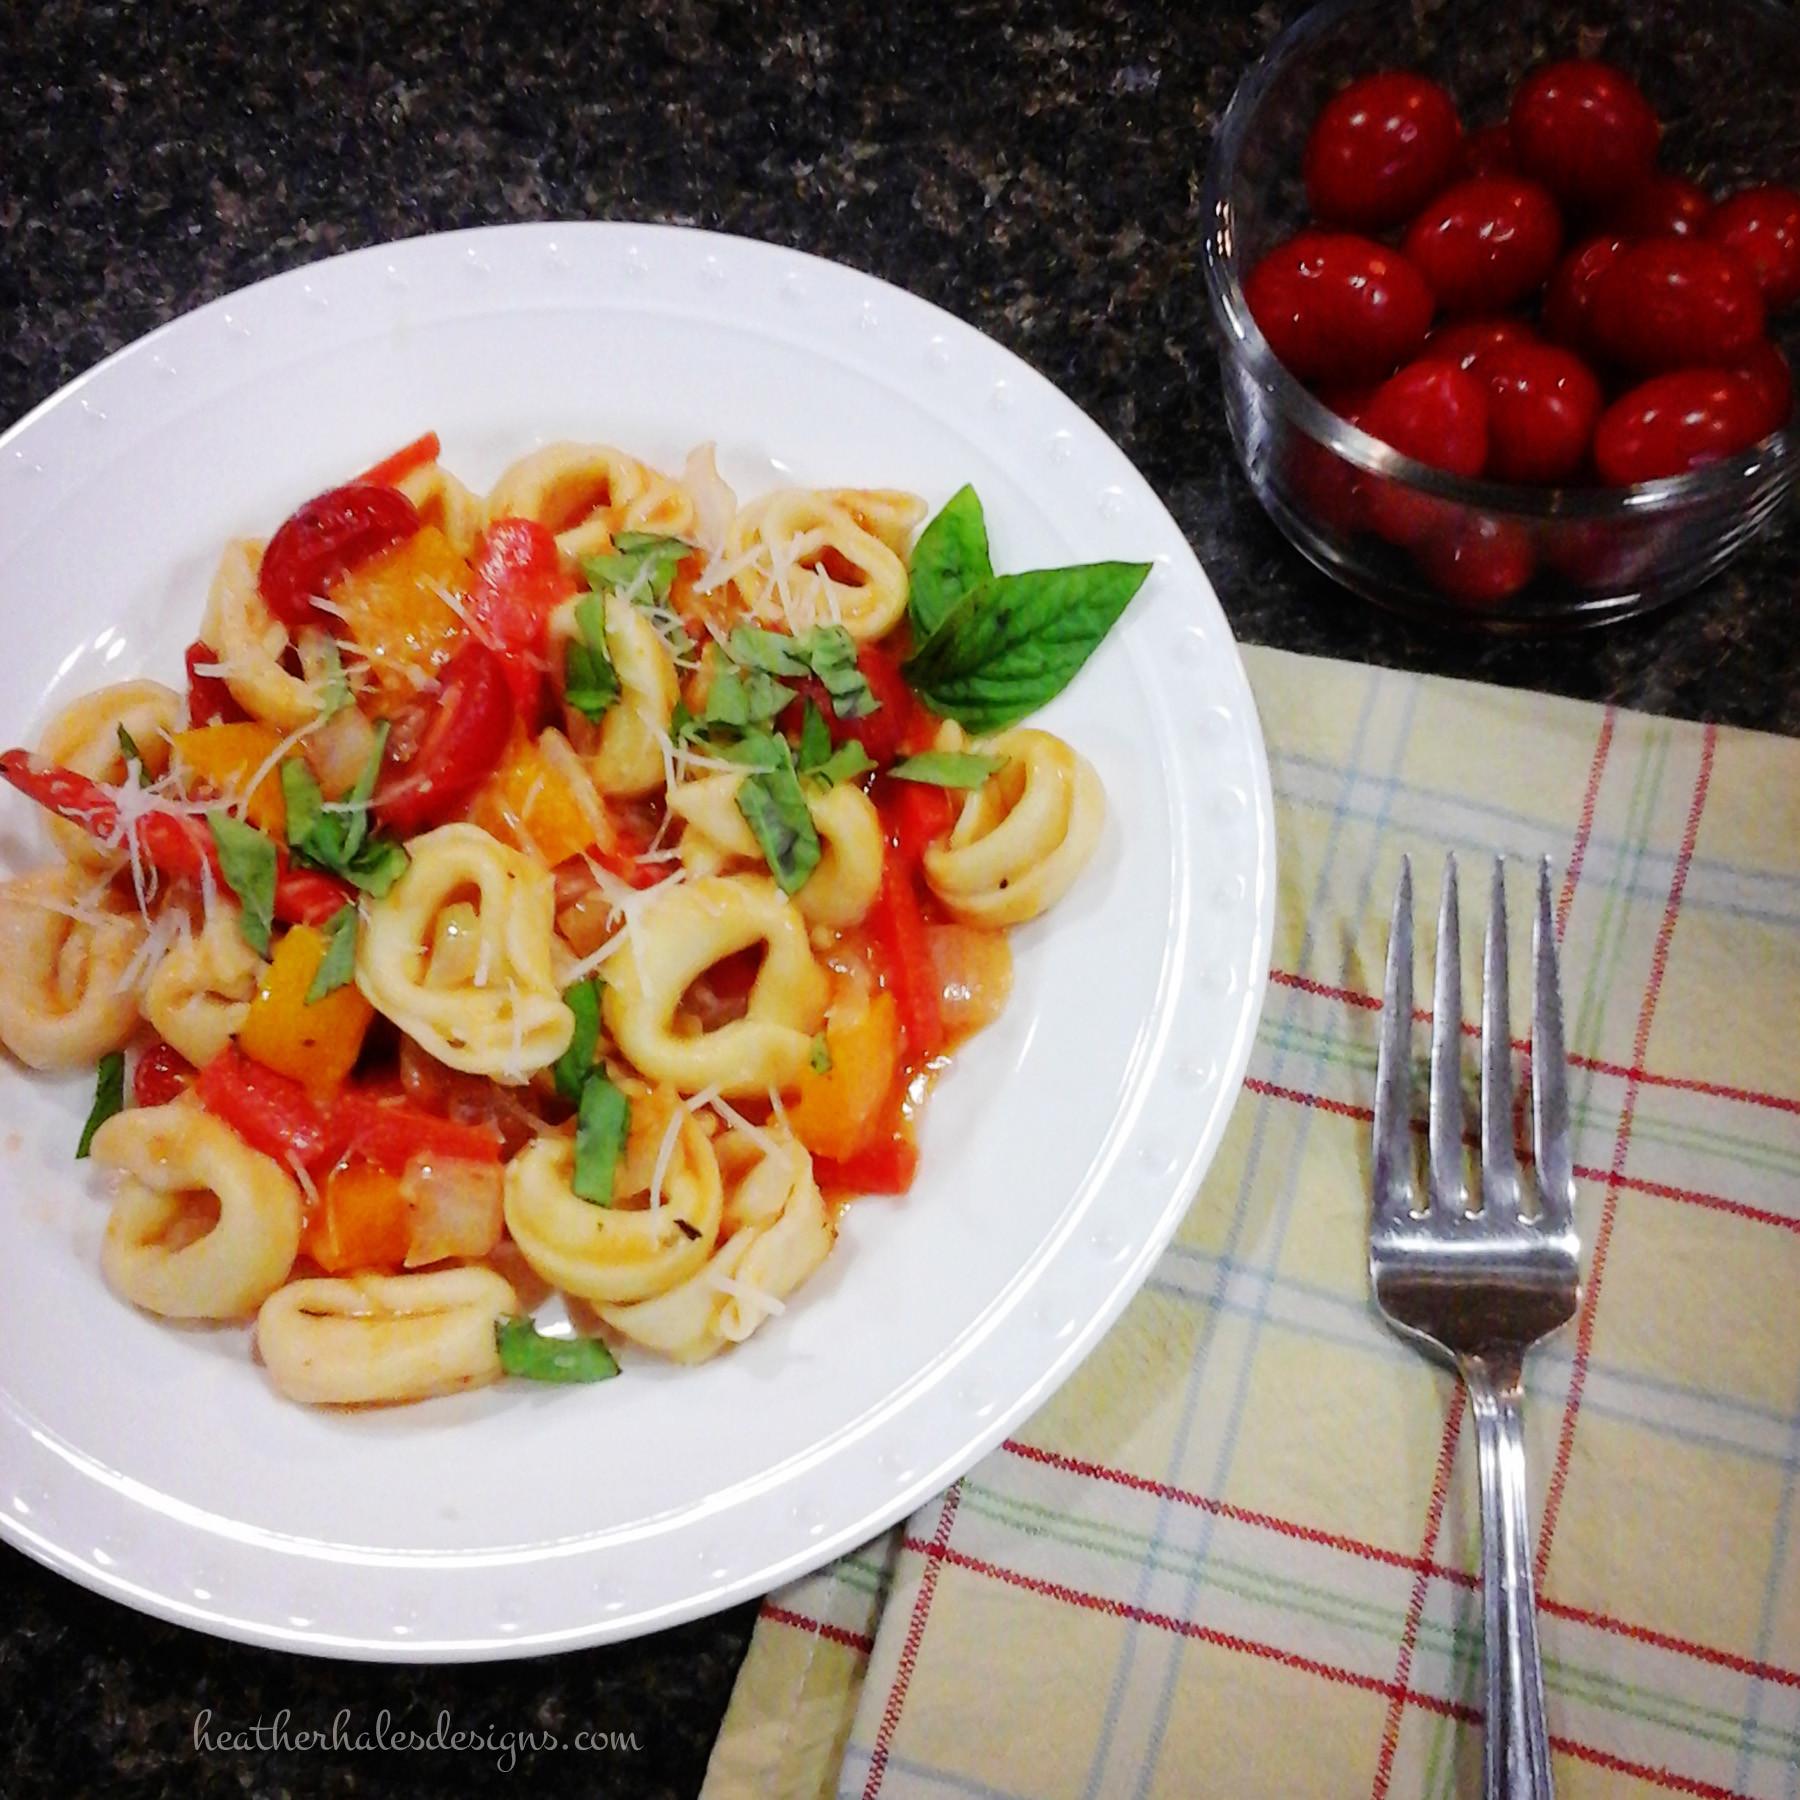 Simple Summer Dinners  heatherhalesdesigns Blog Archive Super Easy Summer